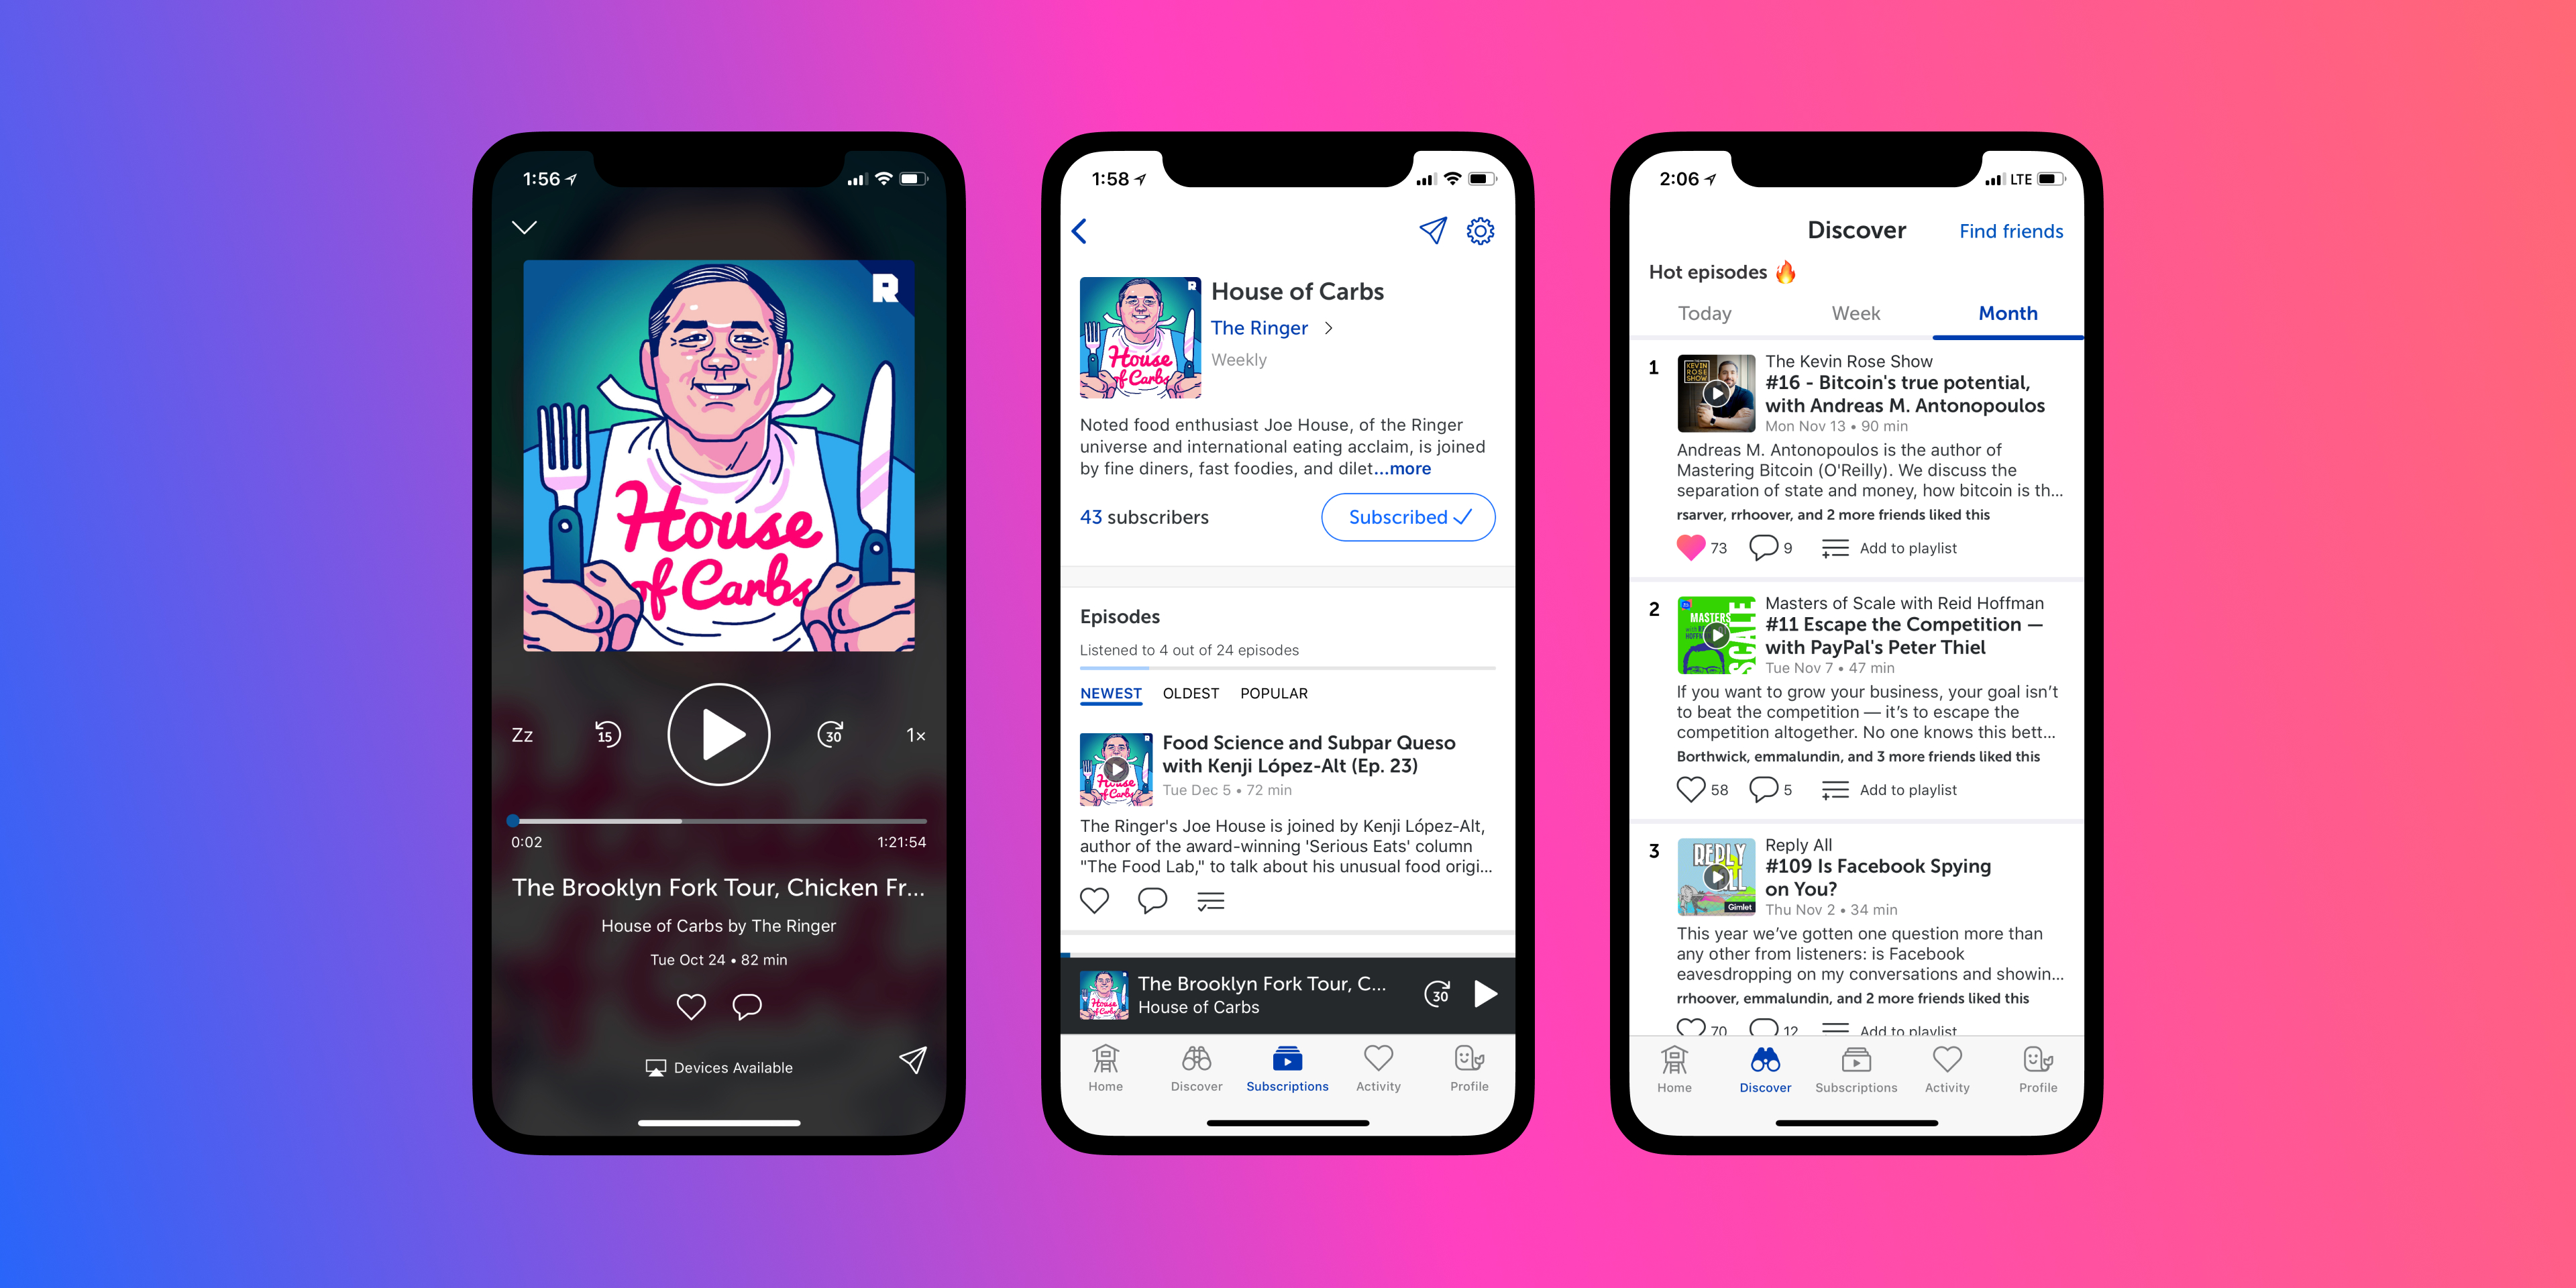 Sample screens from the Breaker app